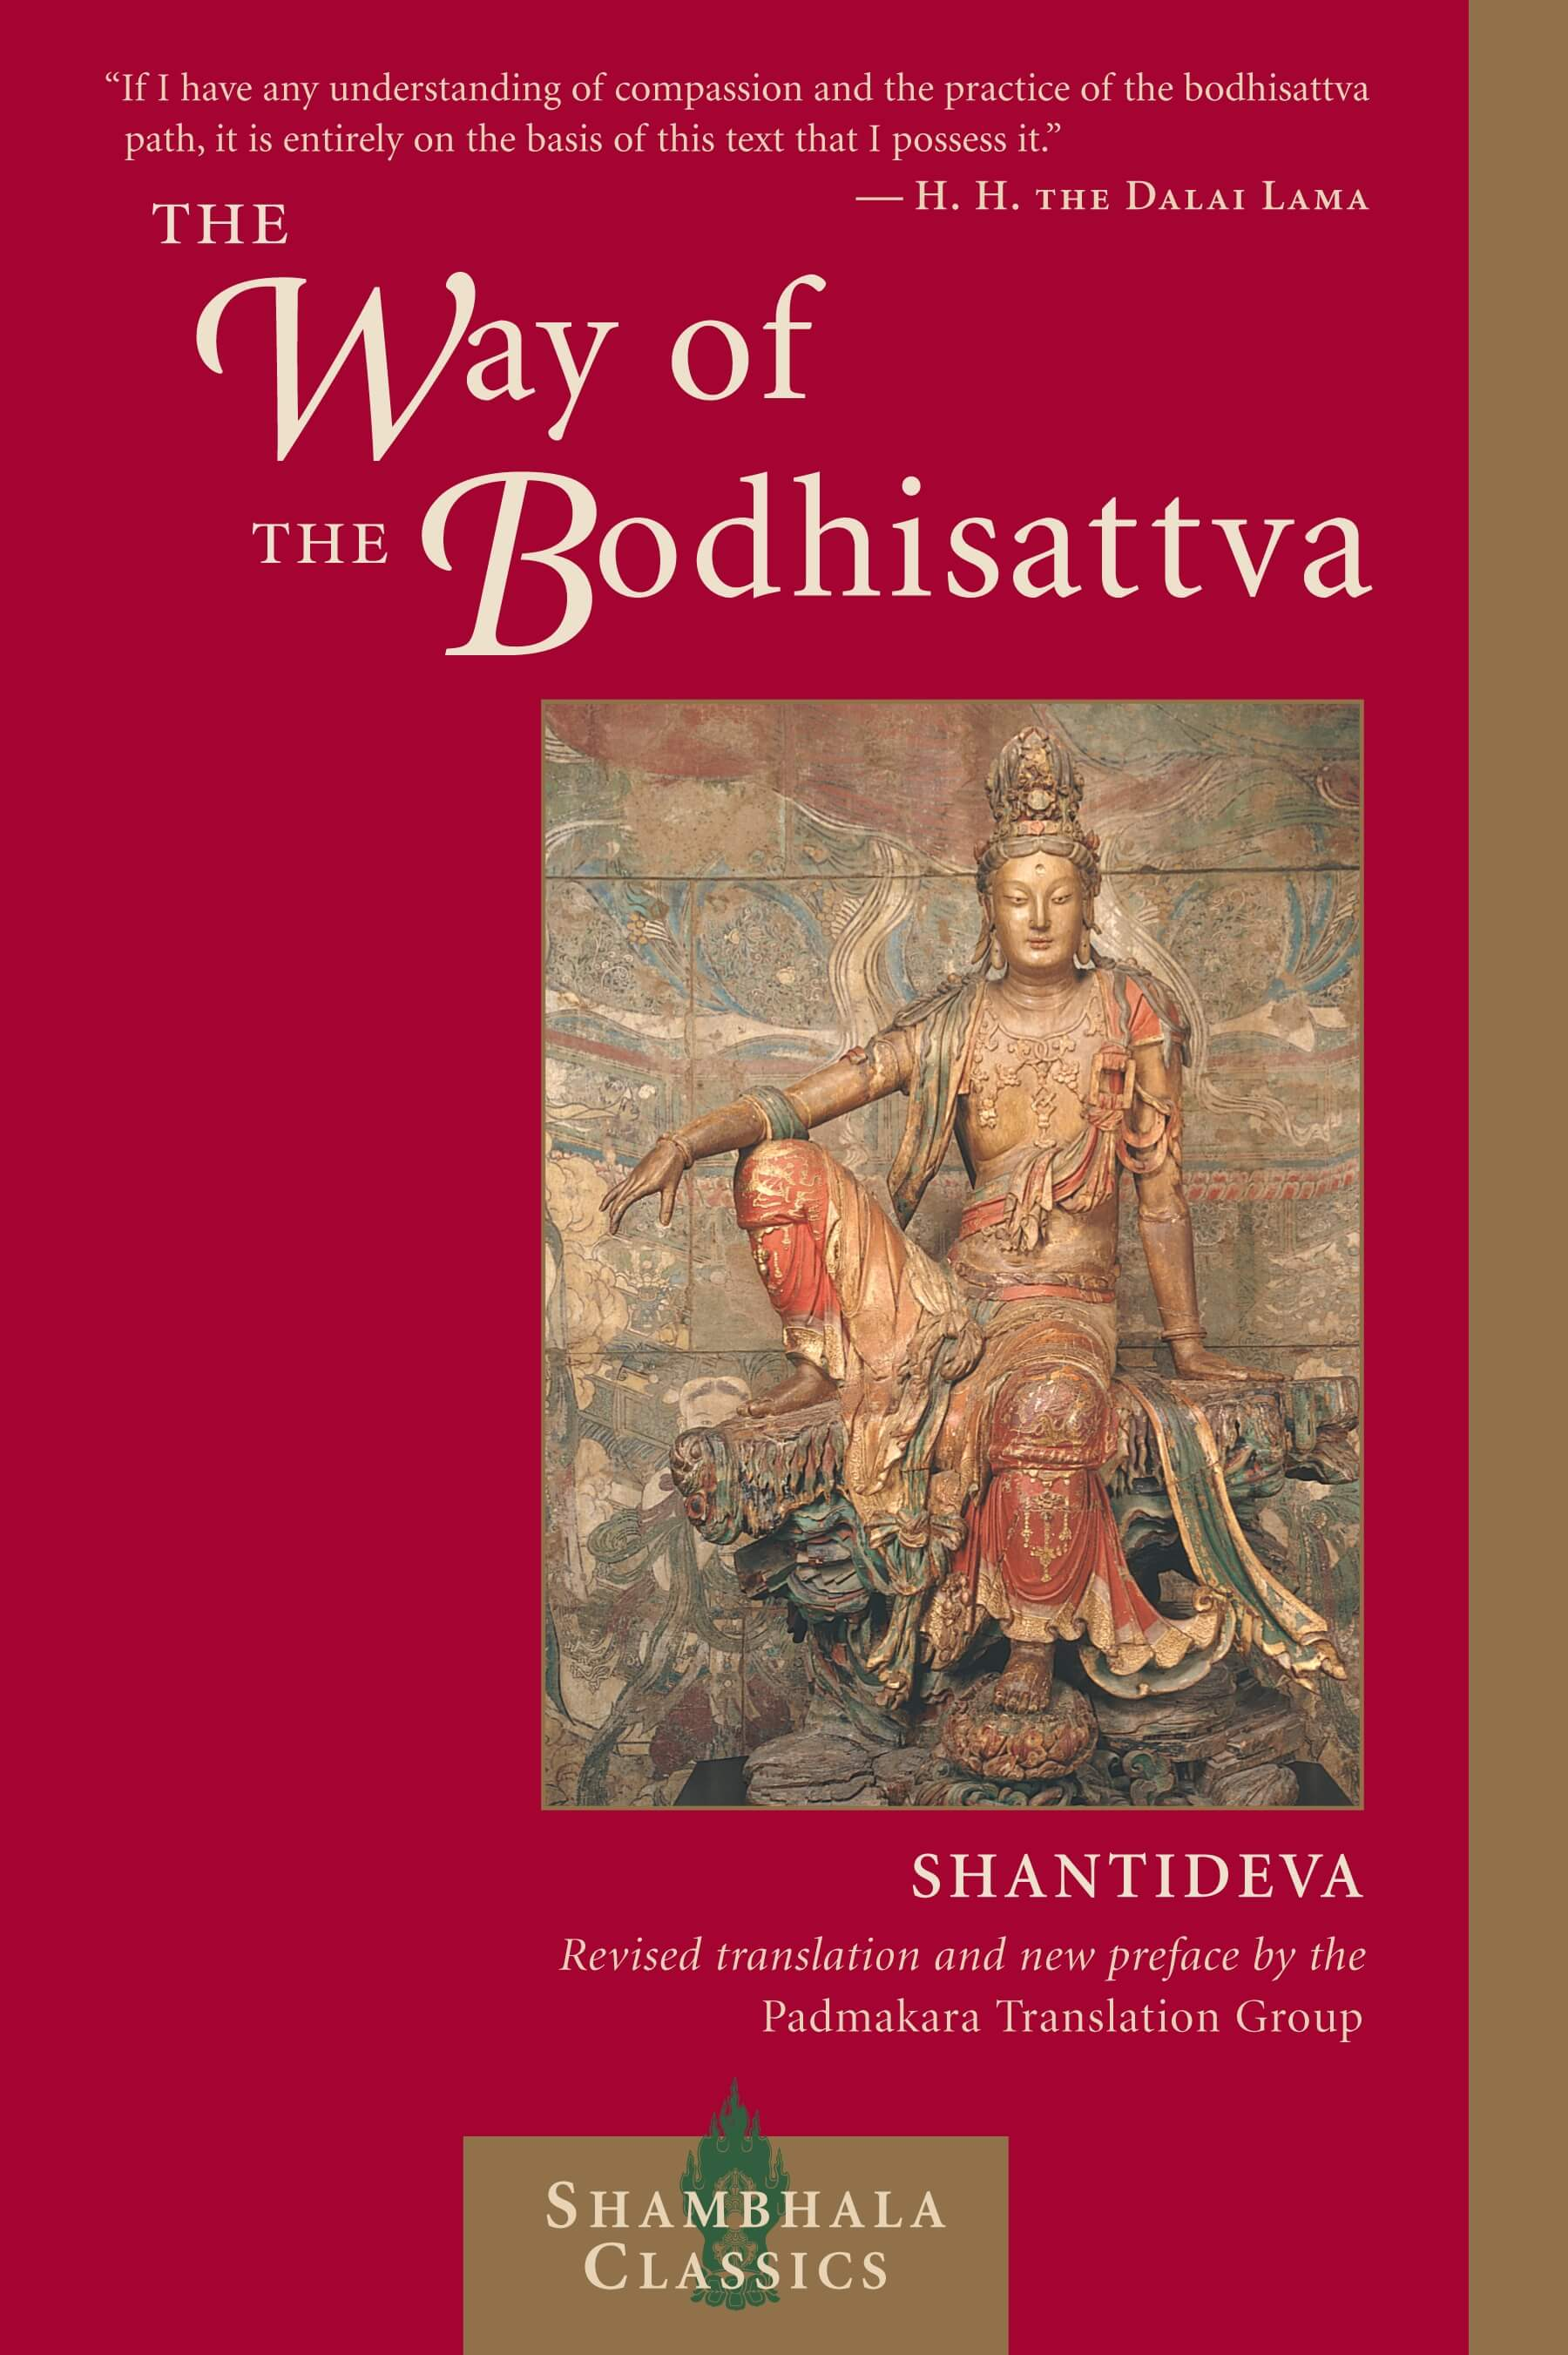 Translating the Way of the Bodhisattva